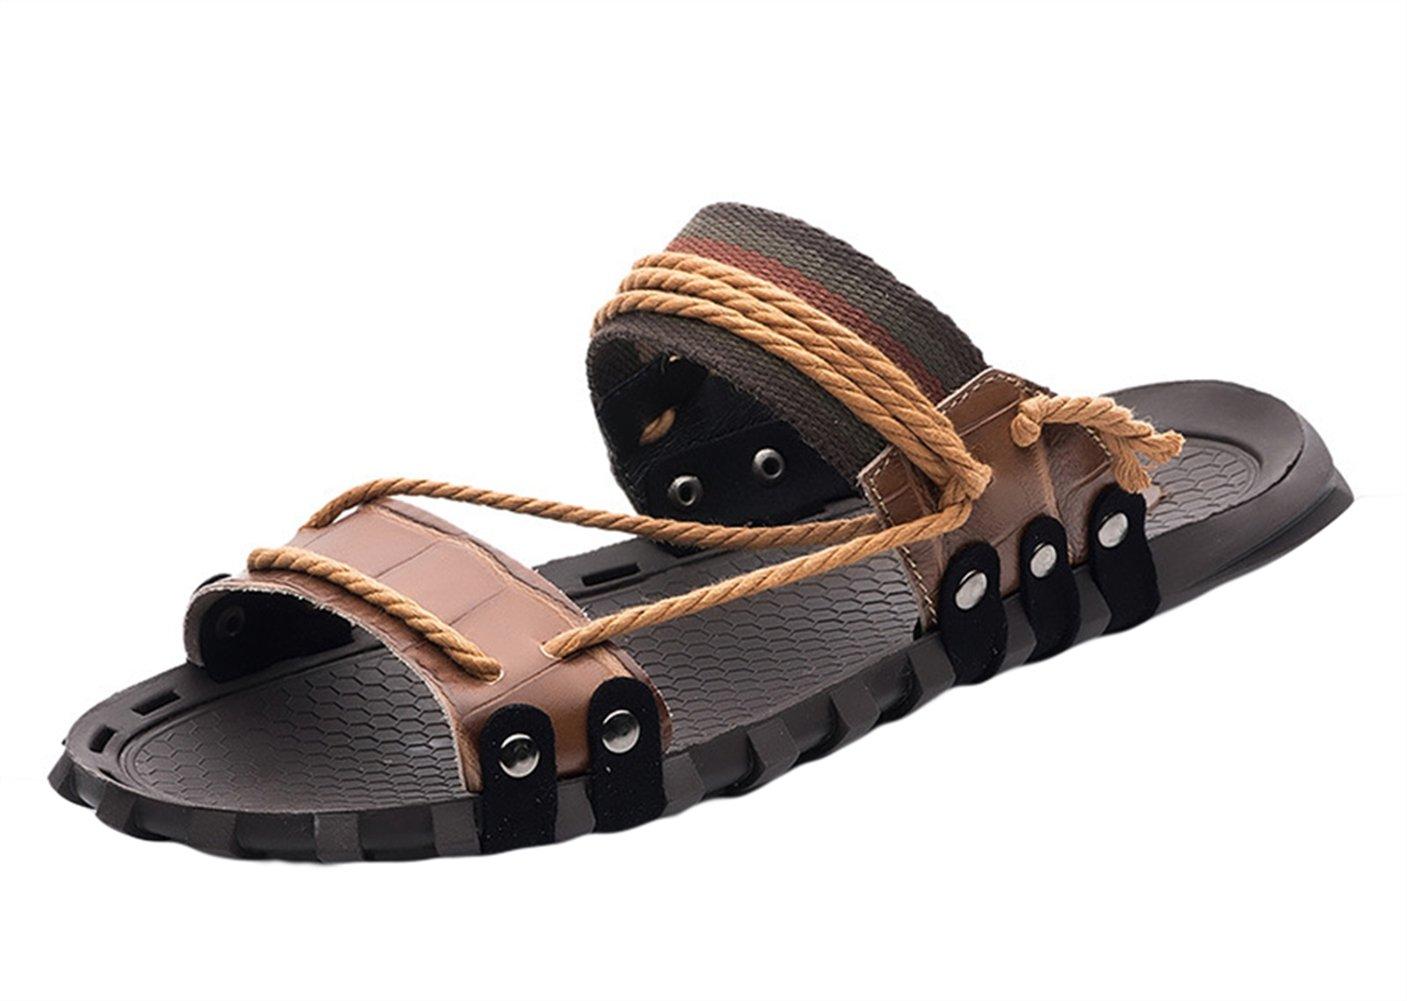 Insun Zapatilla de Cuero Para Hombre Sandalias de Playa 46 EU|Marrón 1